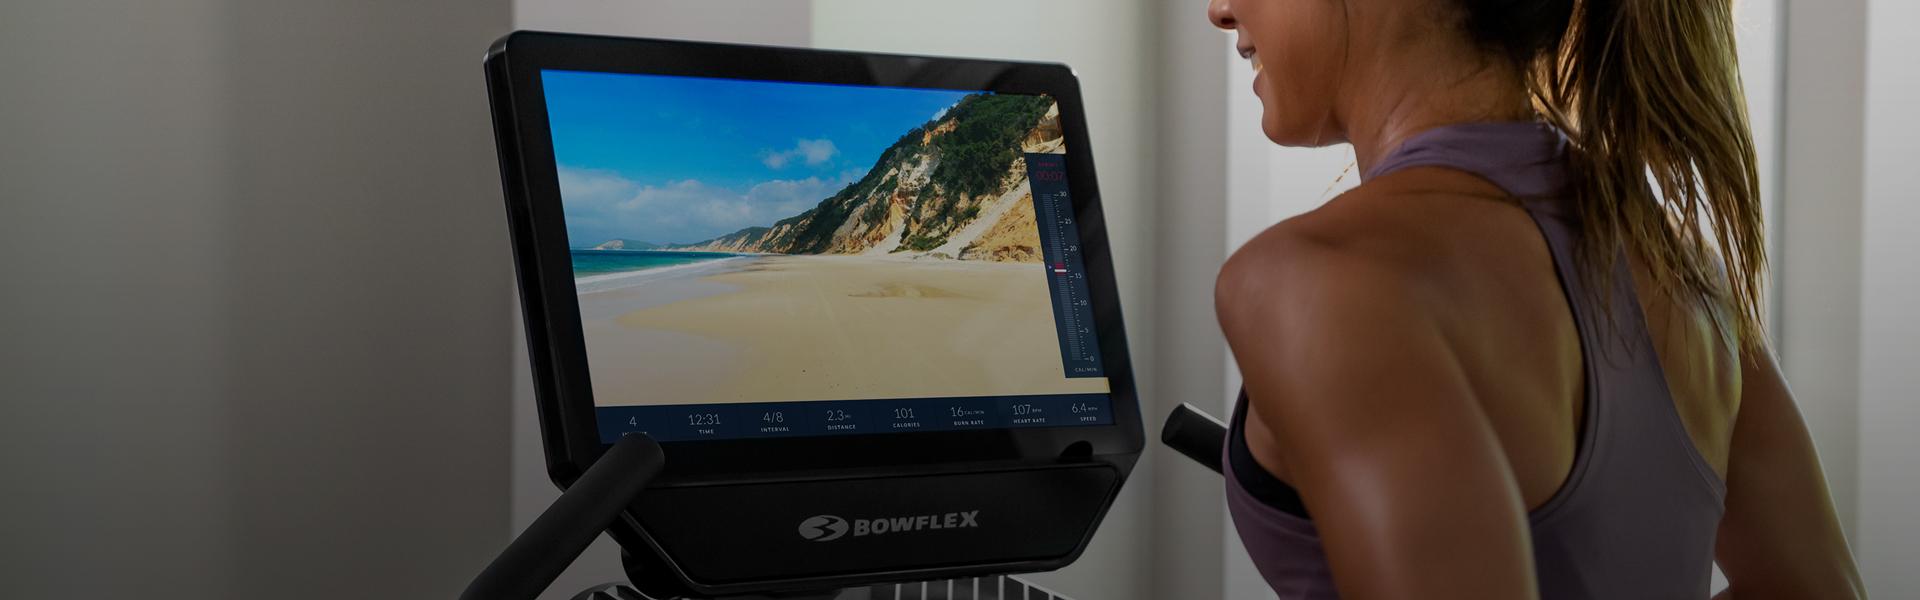 JRNY App for Bowflex